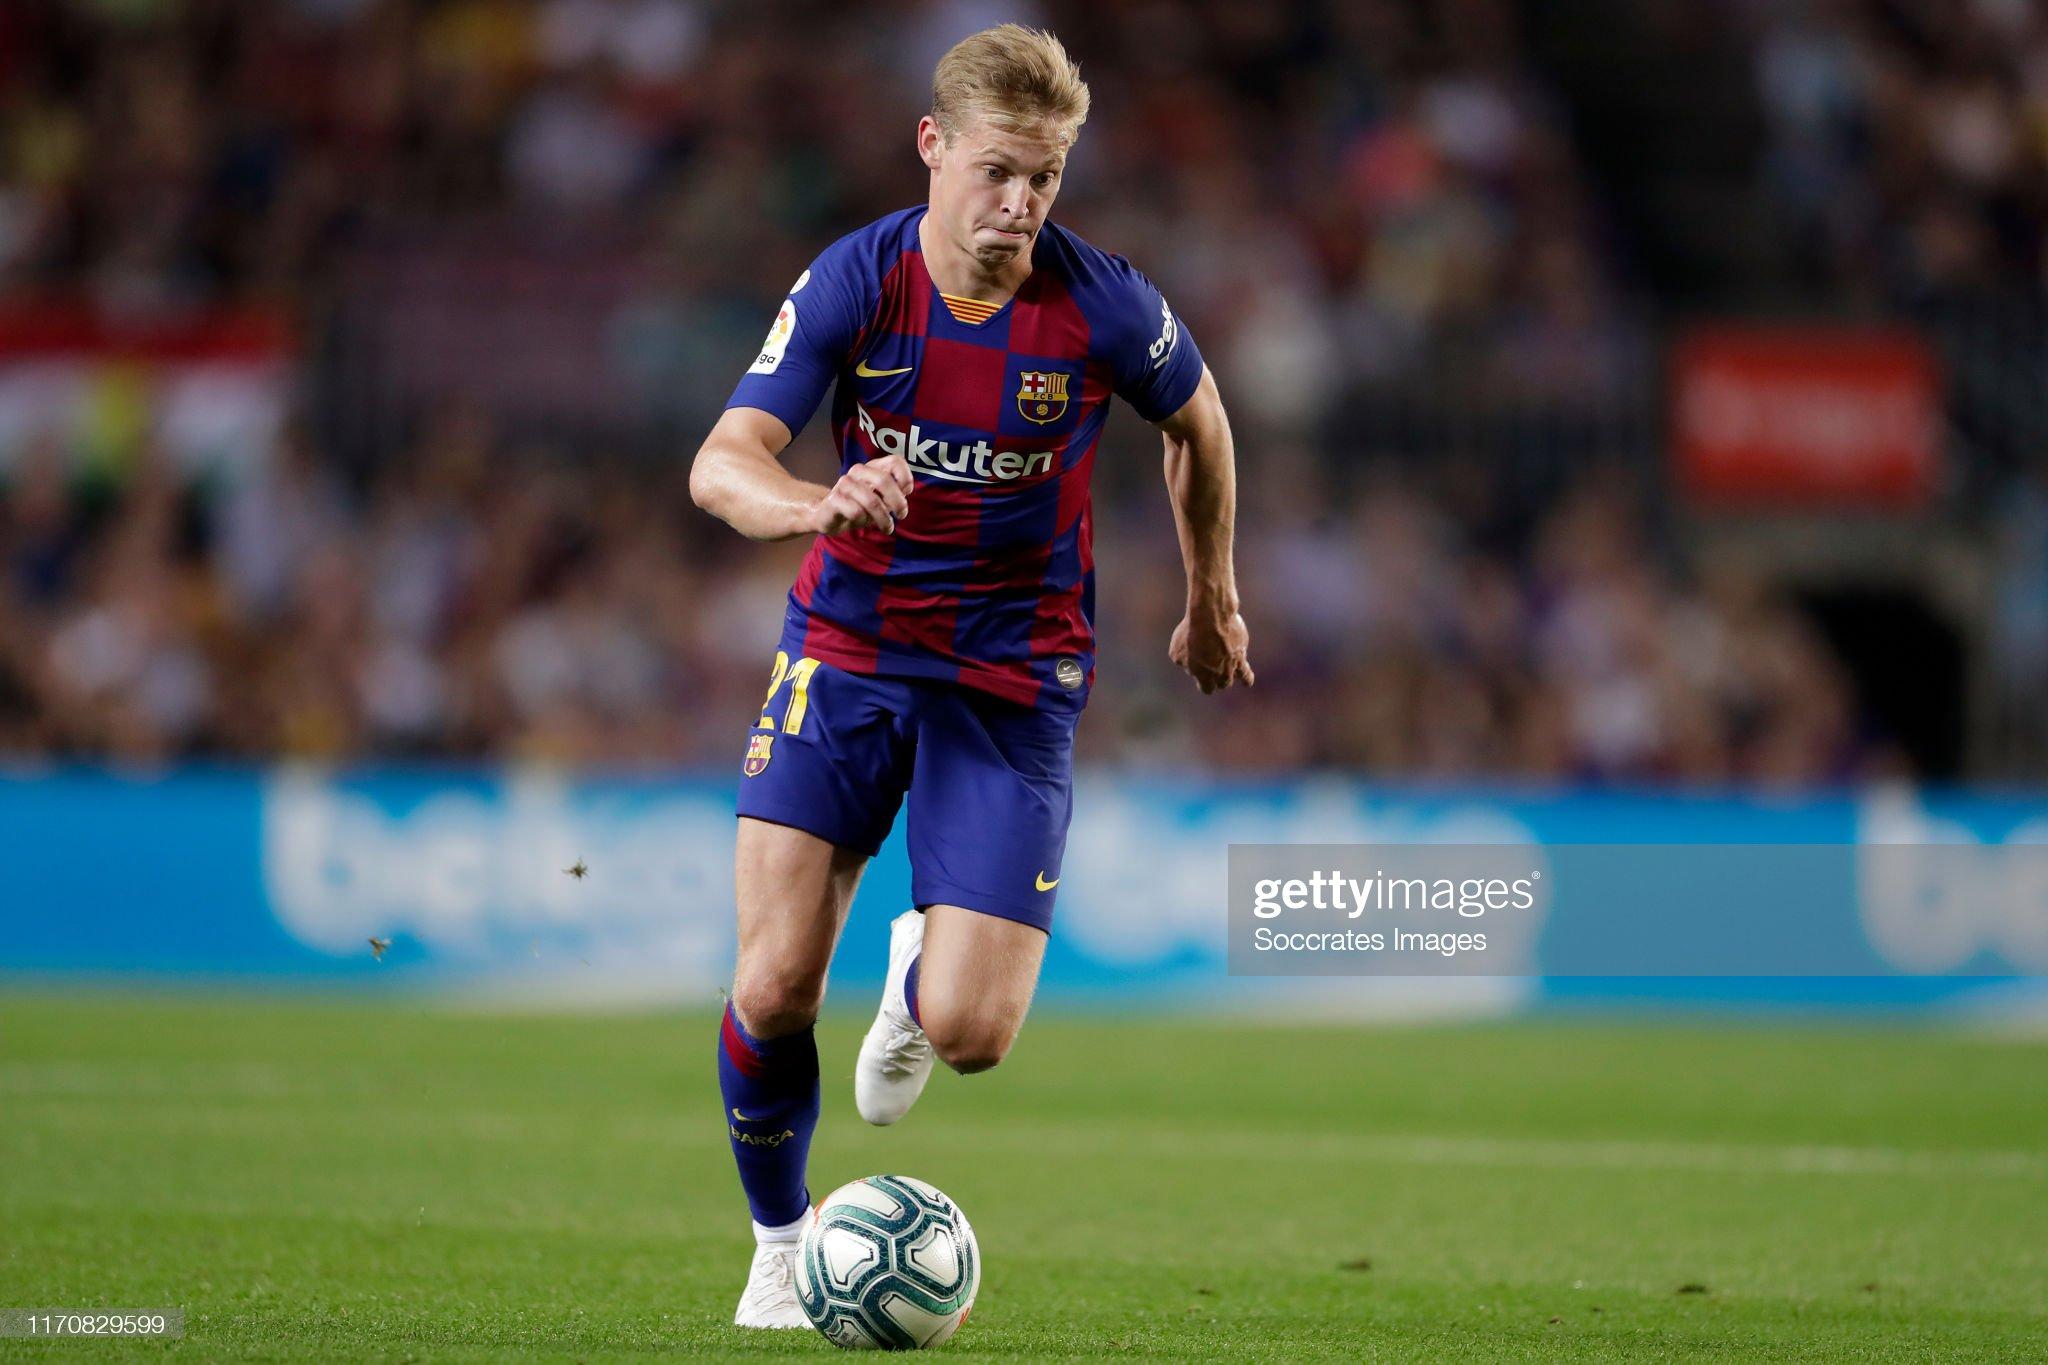 صور مباراة : برشلونة - فياريال 2-1 ( 24-09-2019 )  Frenkie-de-jong-of-fc-barcelona-during-the-la-liga-santander-match-picture-id1170829599?s=2048x2048